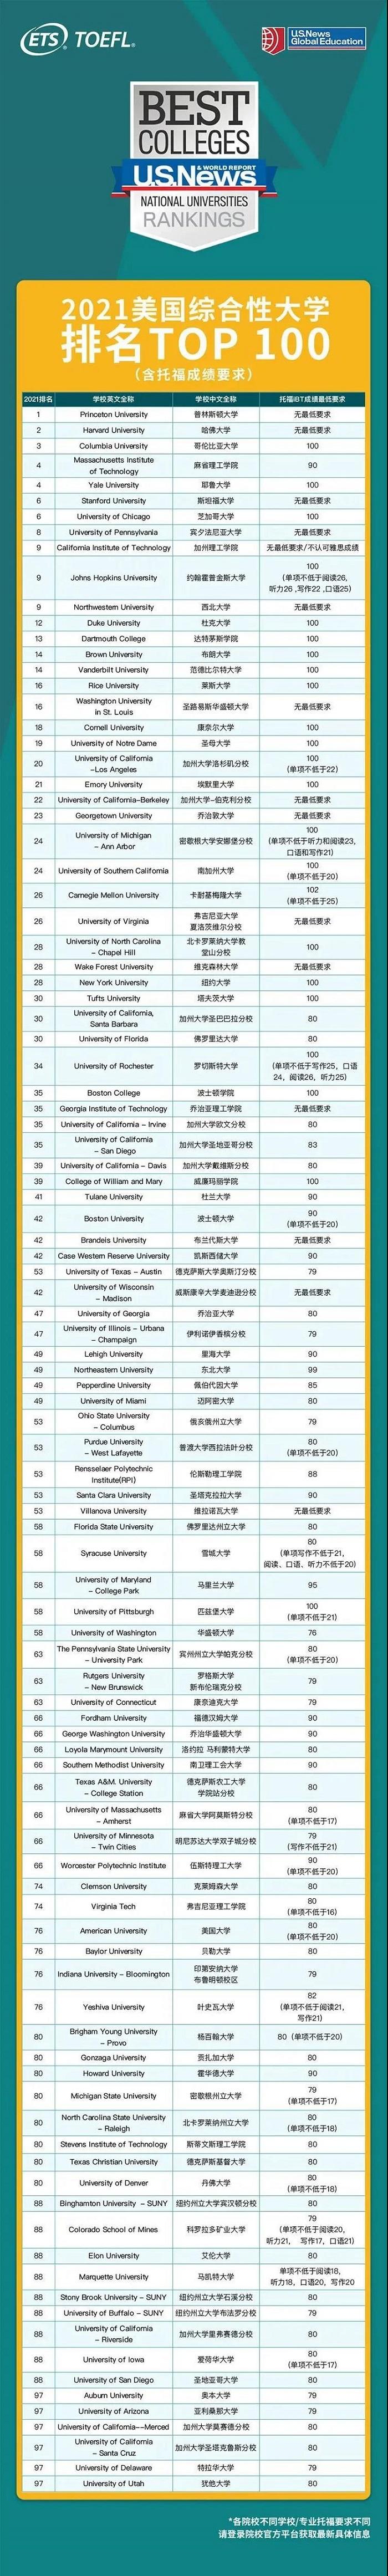 2021U.S.News美国大学排名TOP100院校托福要求